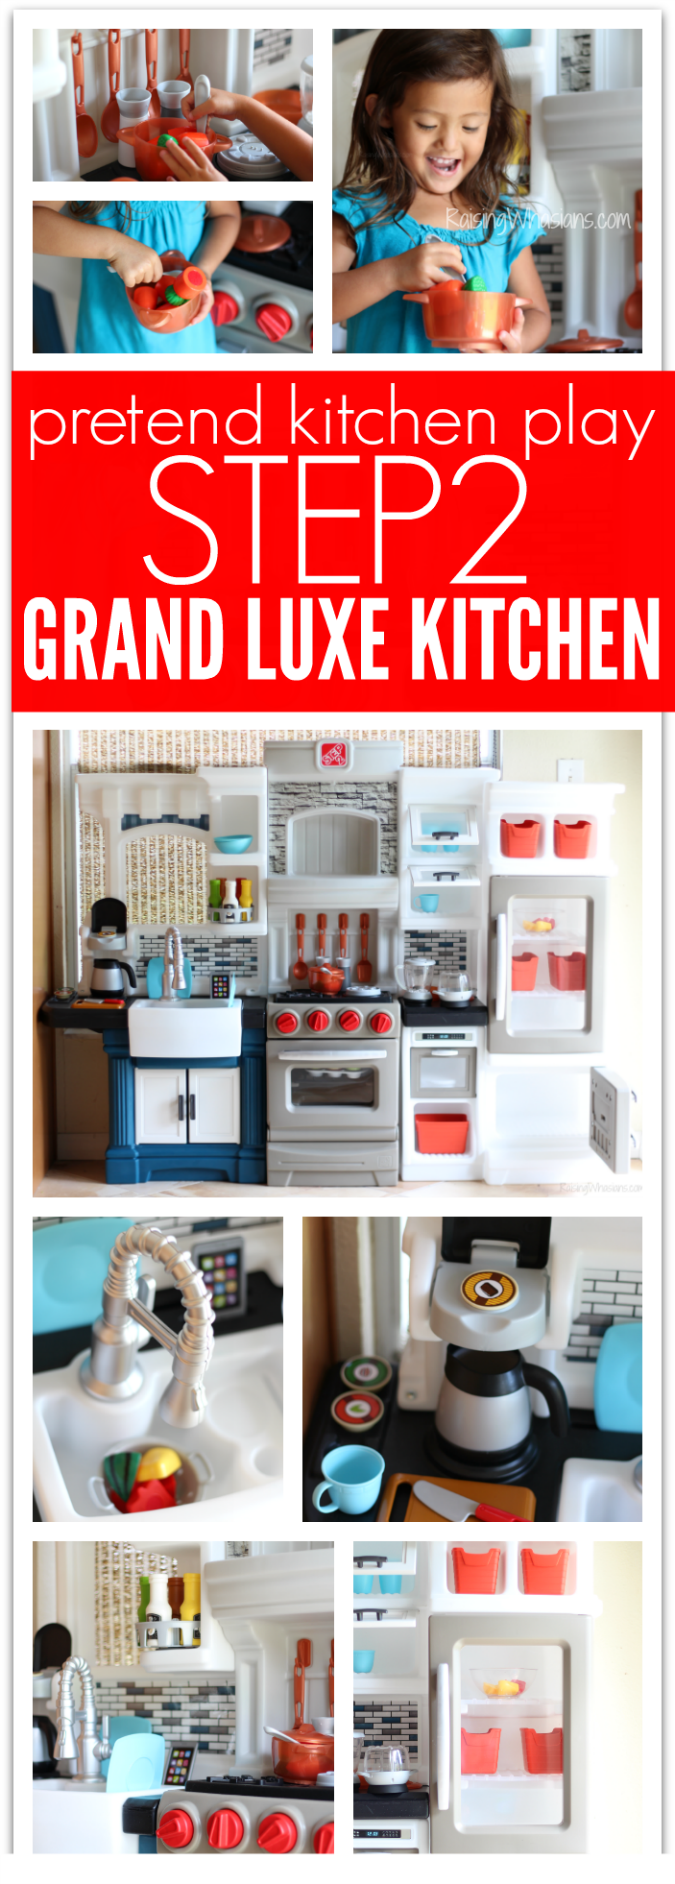 Step2 grand luxe kitchen pinterest